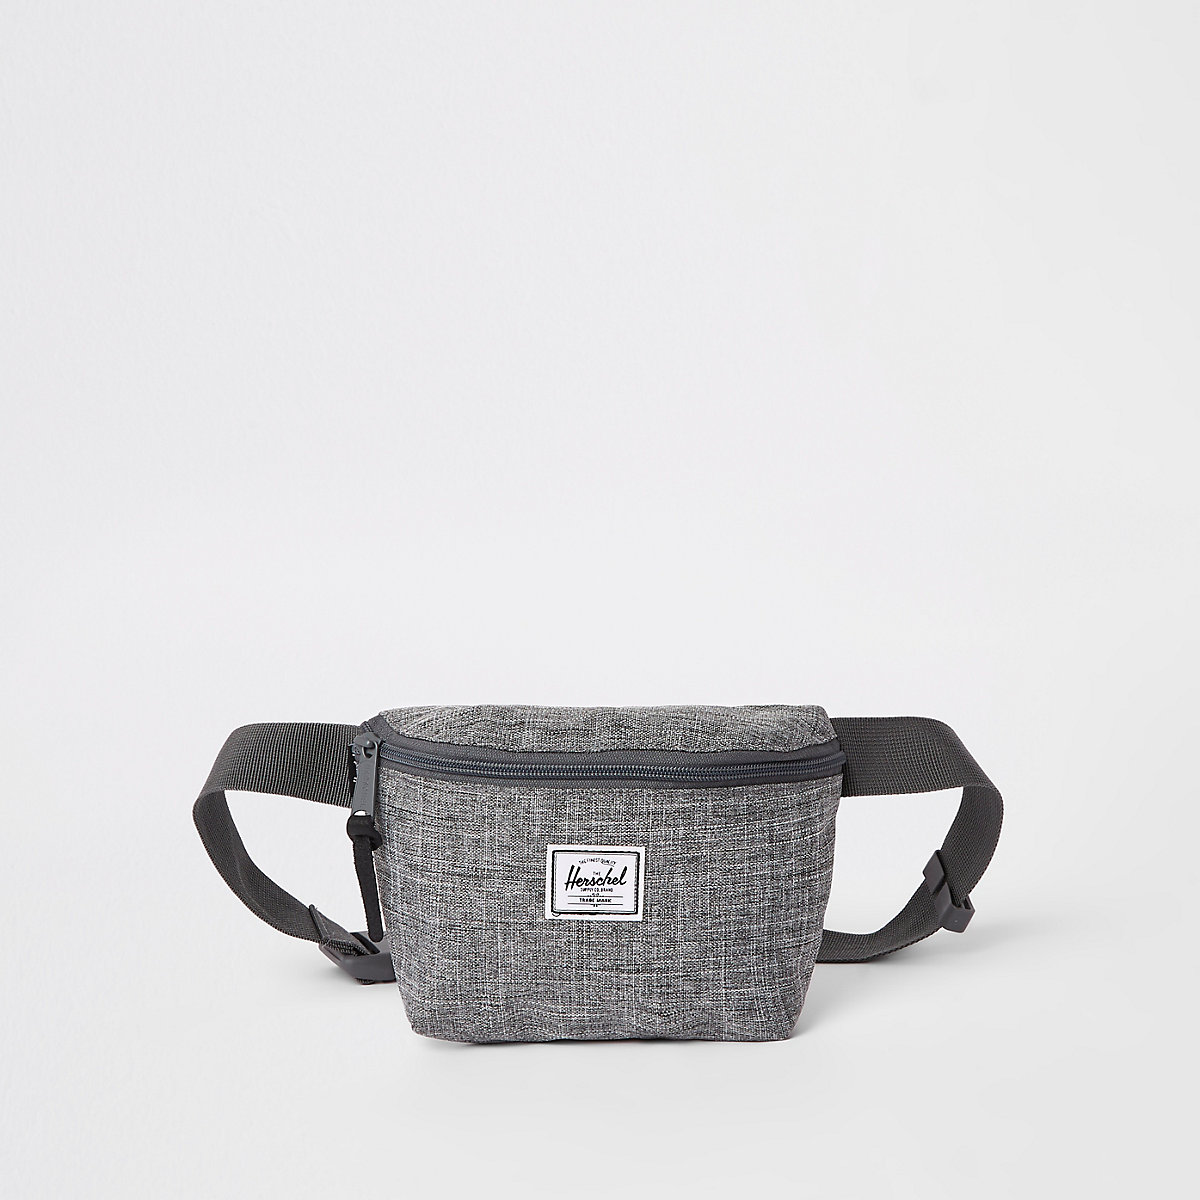 Herschel grey marl Fourteen cross body bag